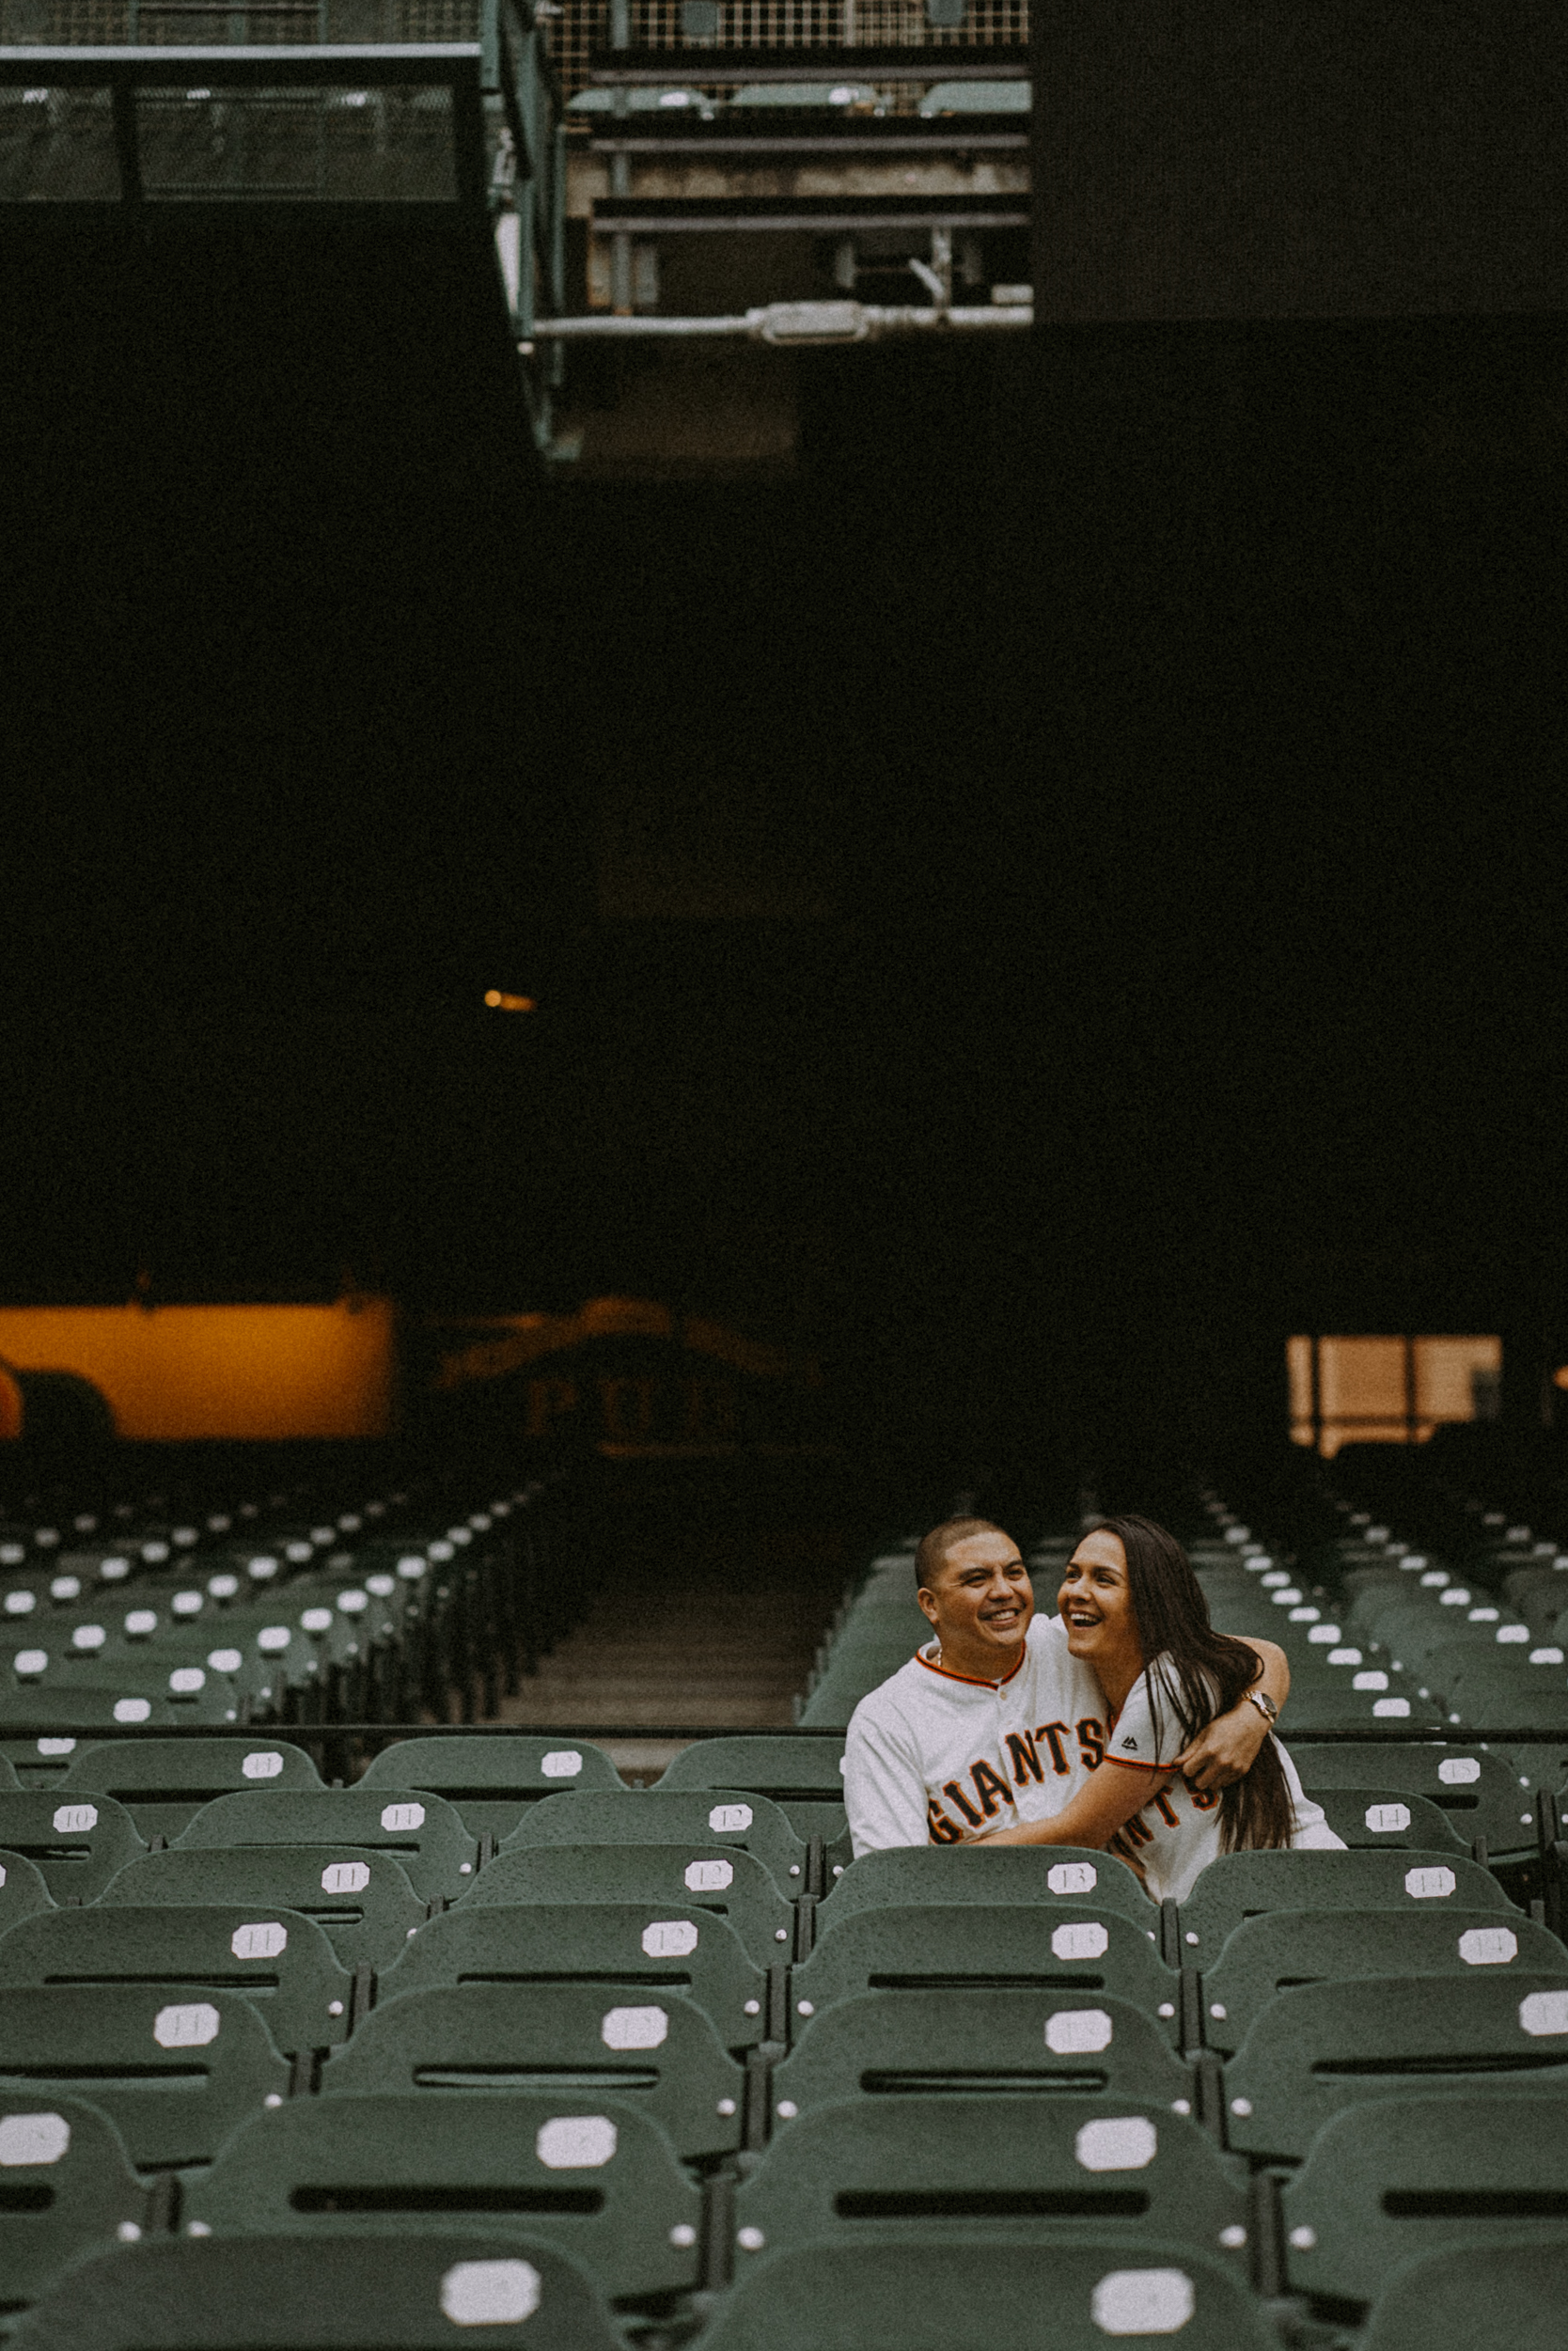 San-Francisco-engagement-wedding-photographer-Giants-AT&T-Park-3.jpg